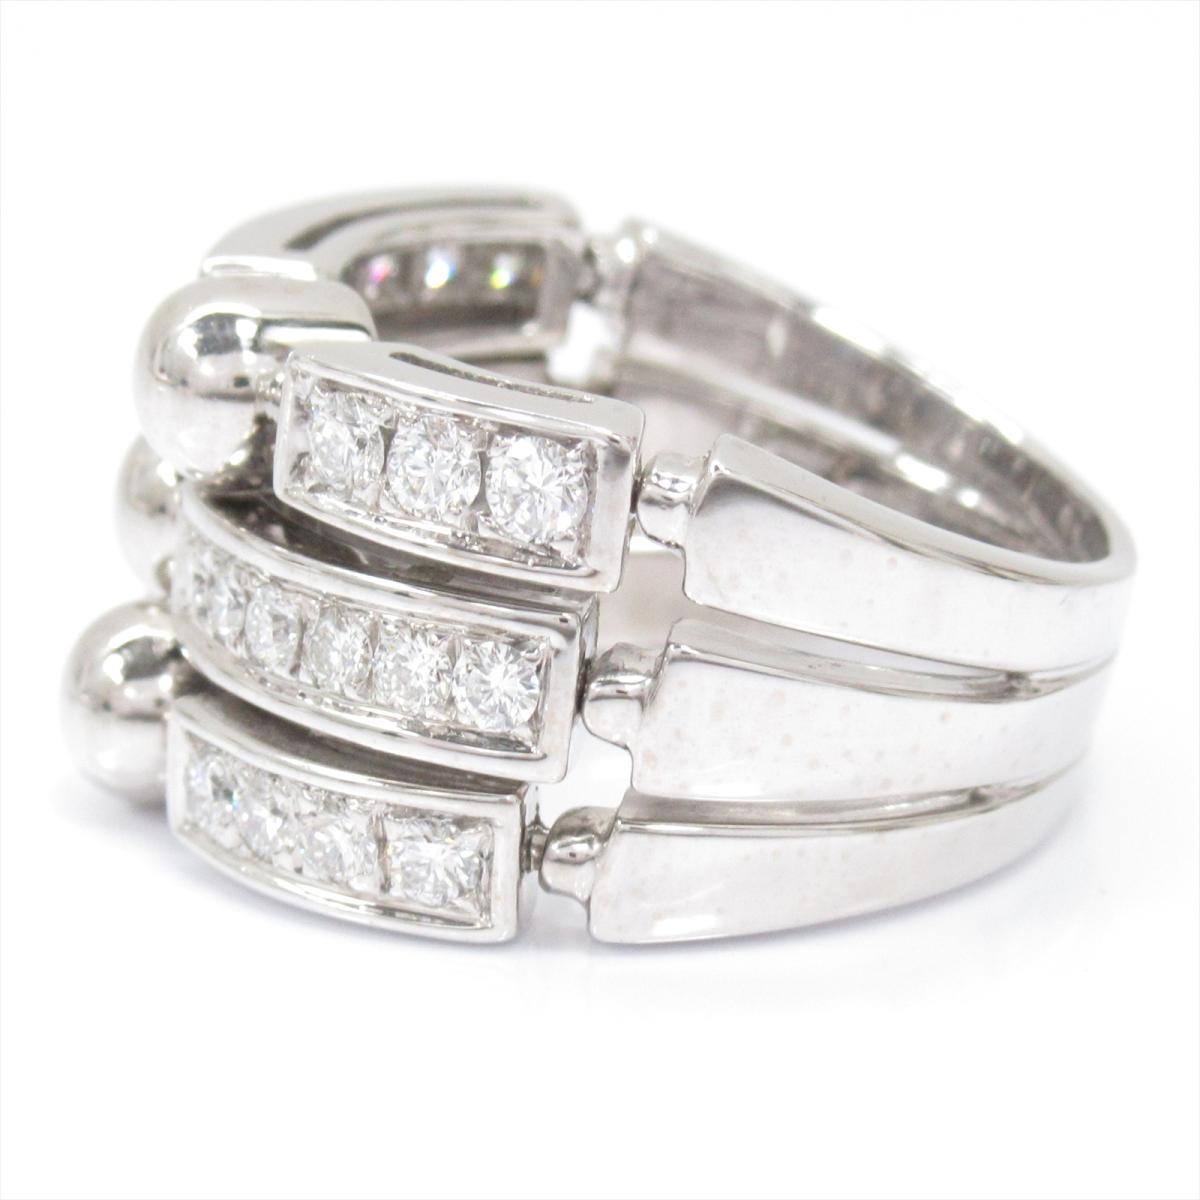 on sale 268bb 9fc0b 楽天市場】ブルガリ アストラーレ ダイヤモンドリング 指輪 ...